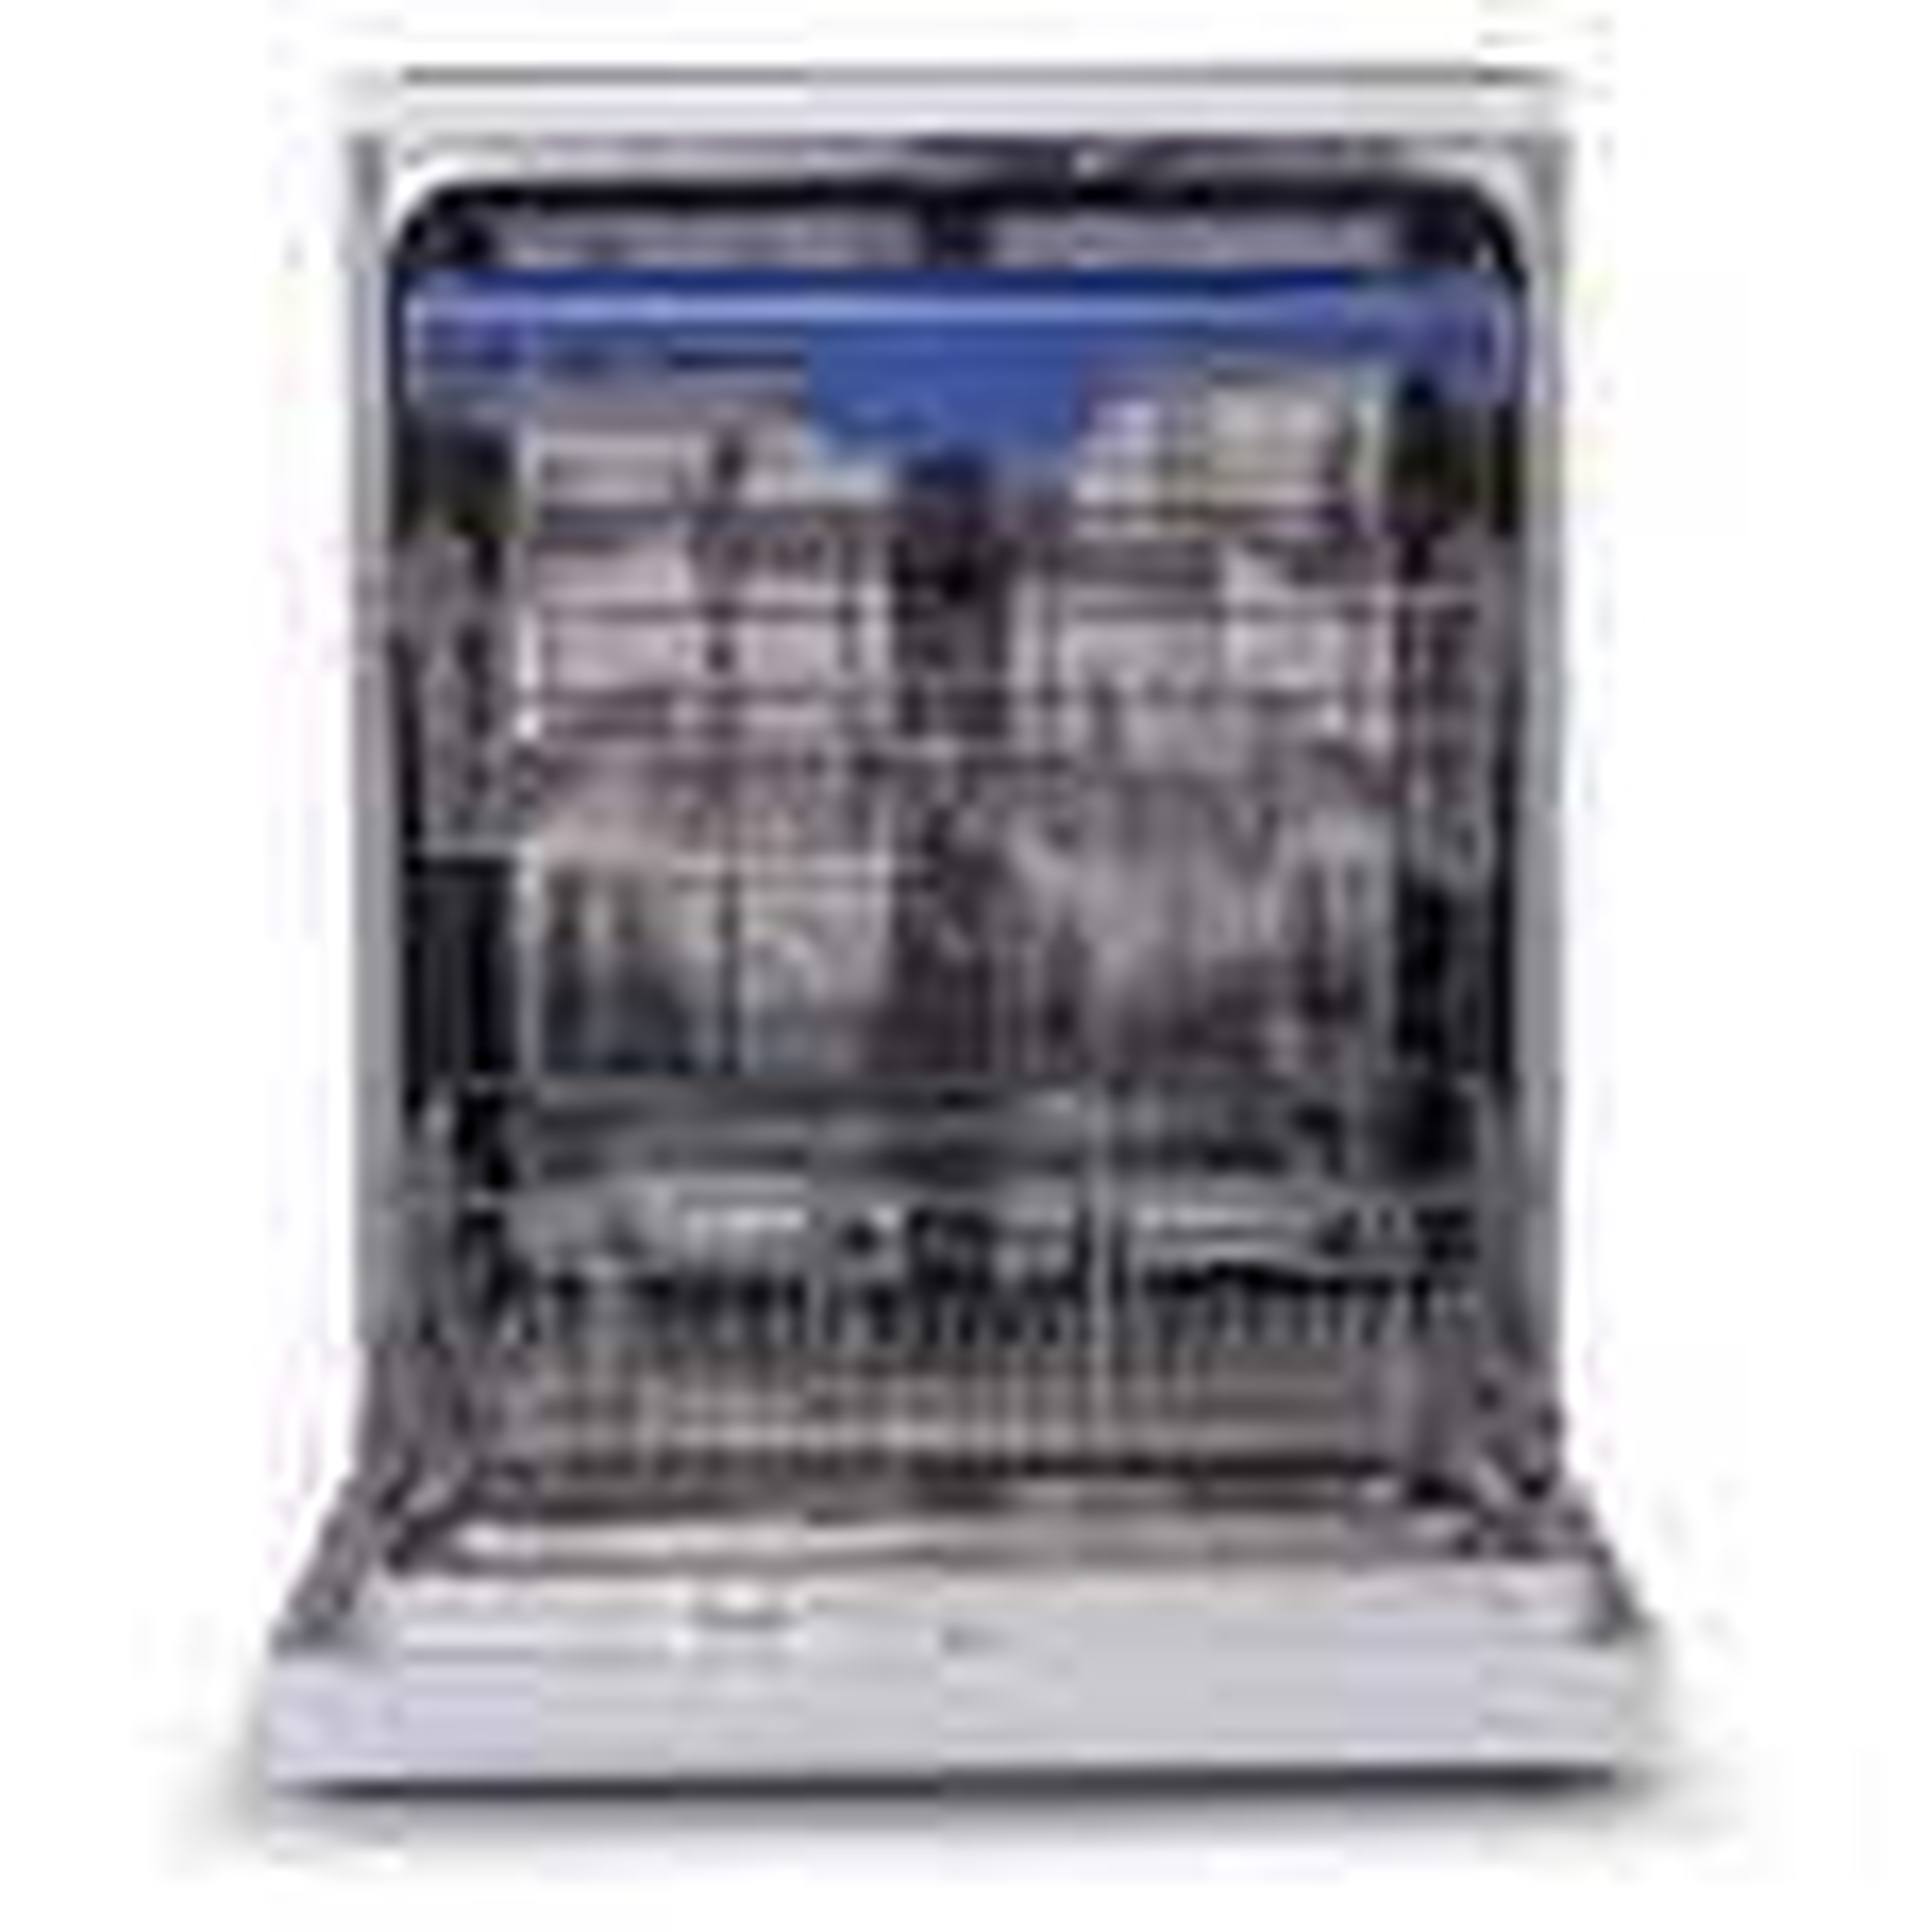 ماشین ظرفشویی کرال مدل DS 1417 thumb 4